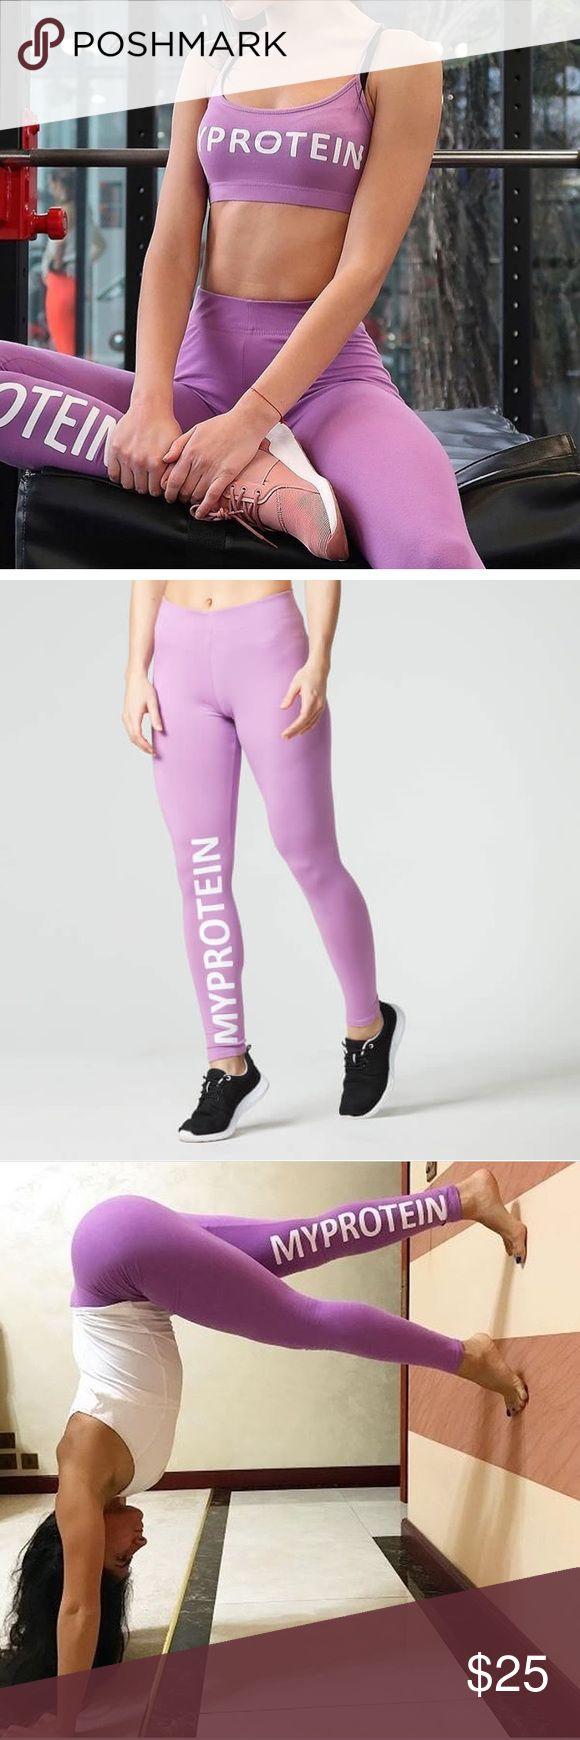 Leggings My protein leggings Myprotein leggings Nike Lululemon  Adidas Underarmour Gymshark Pants Leggings